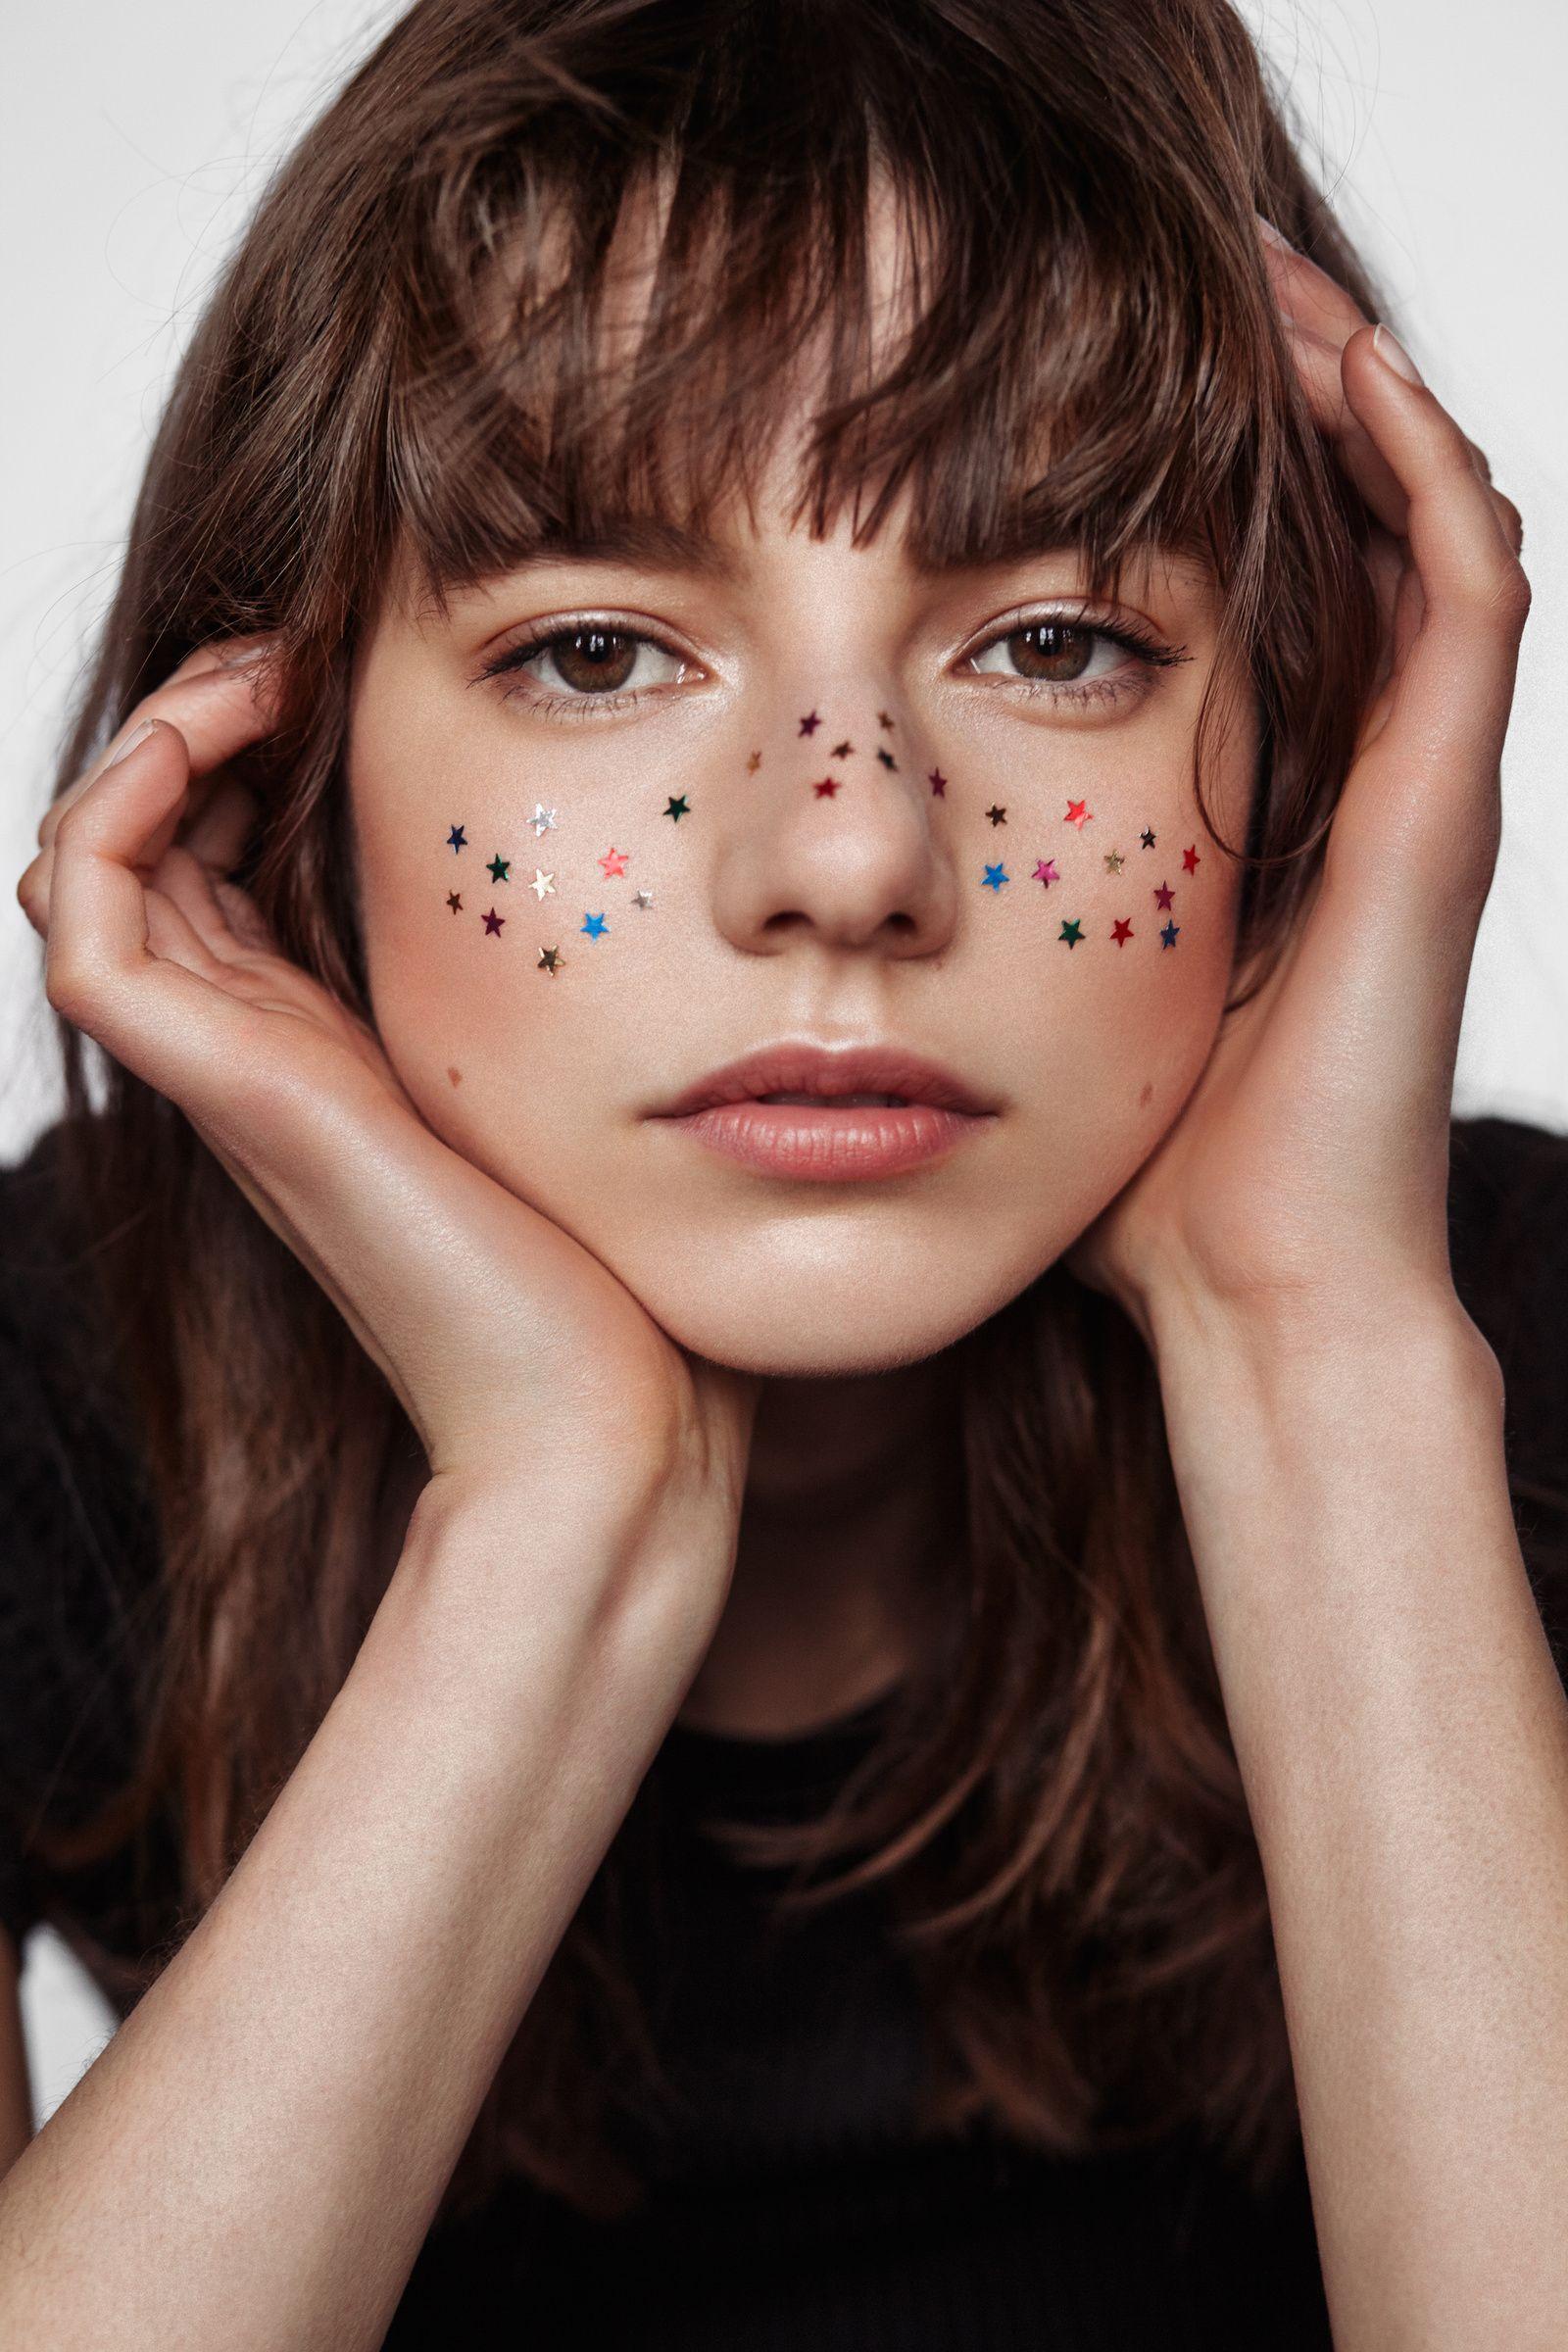 Claire Plekhoff / Makeup artist based in Paris PERSONAL